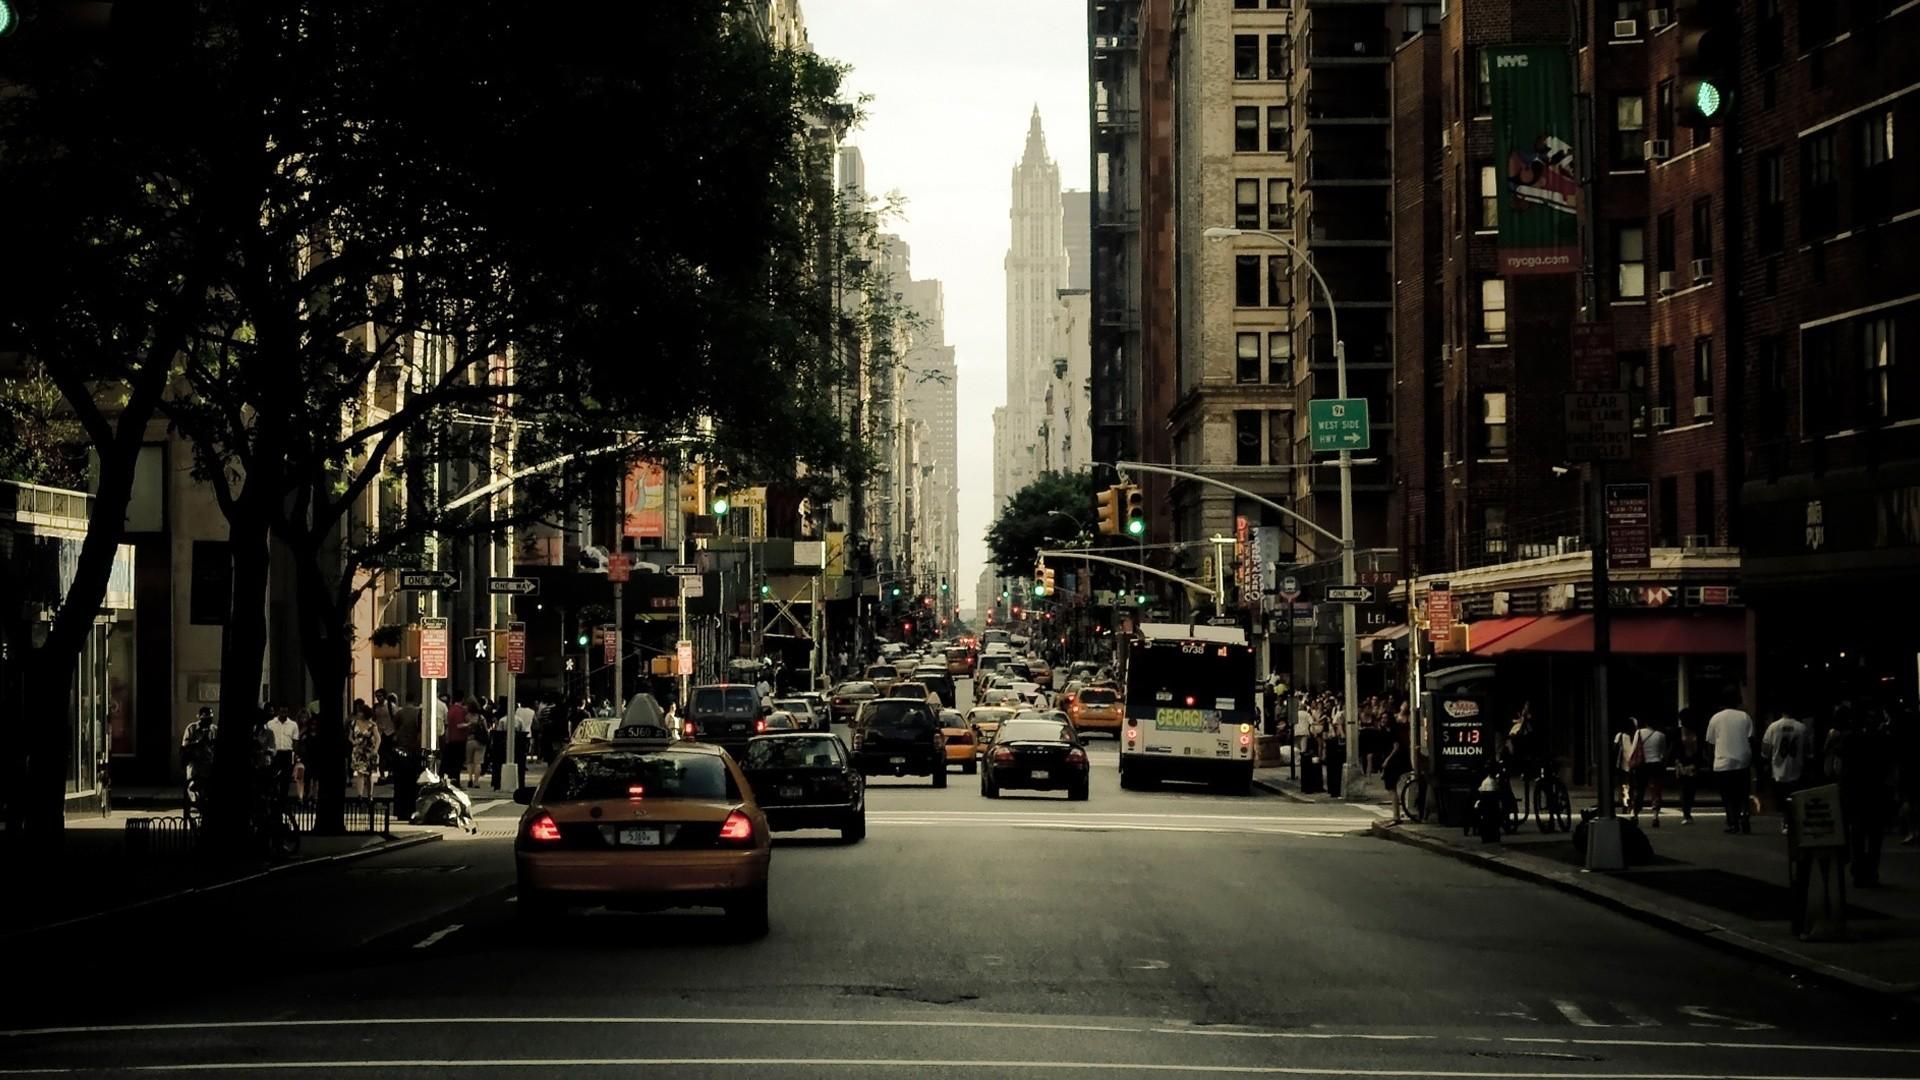 HD New york city street wallpaper.